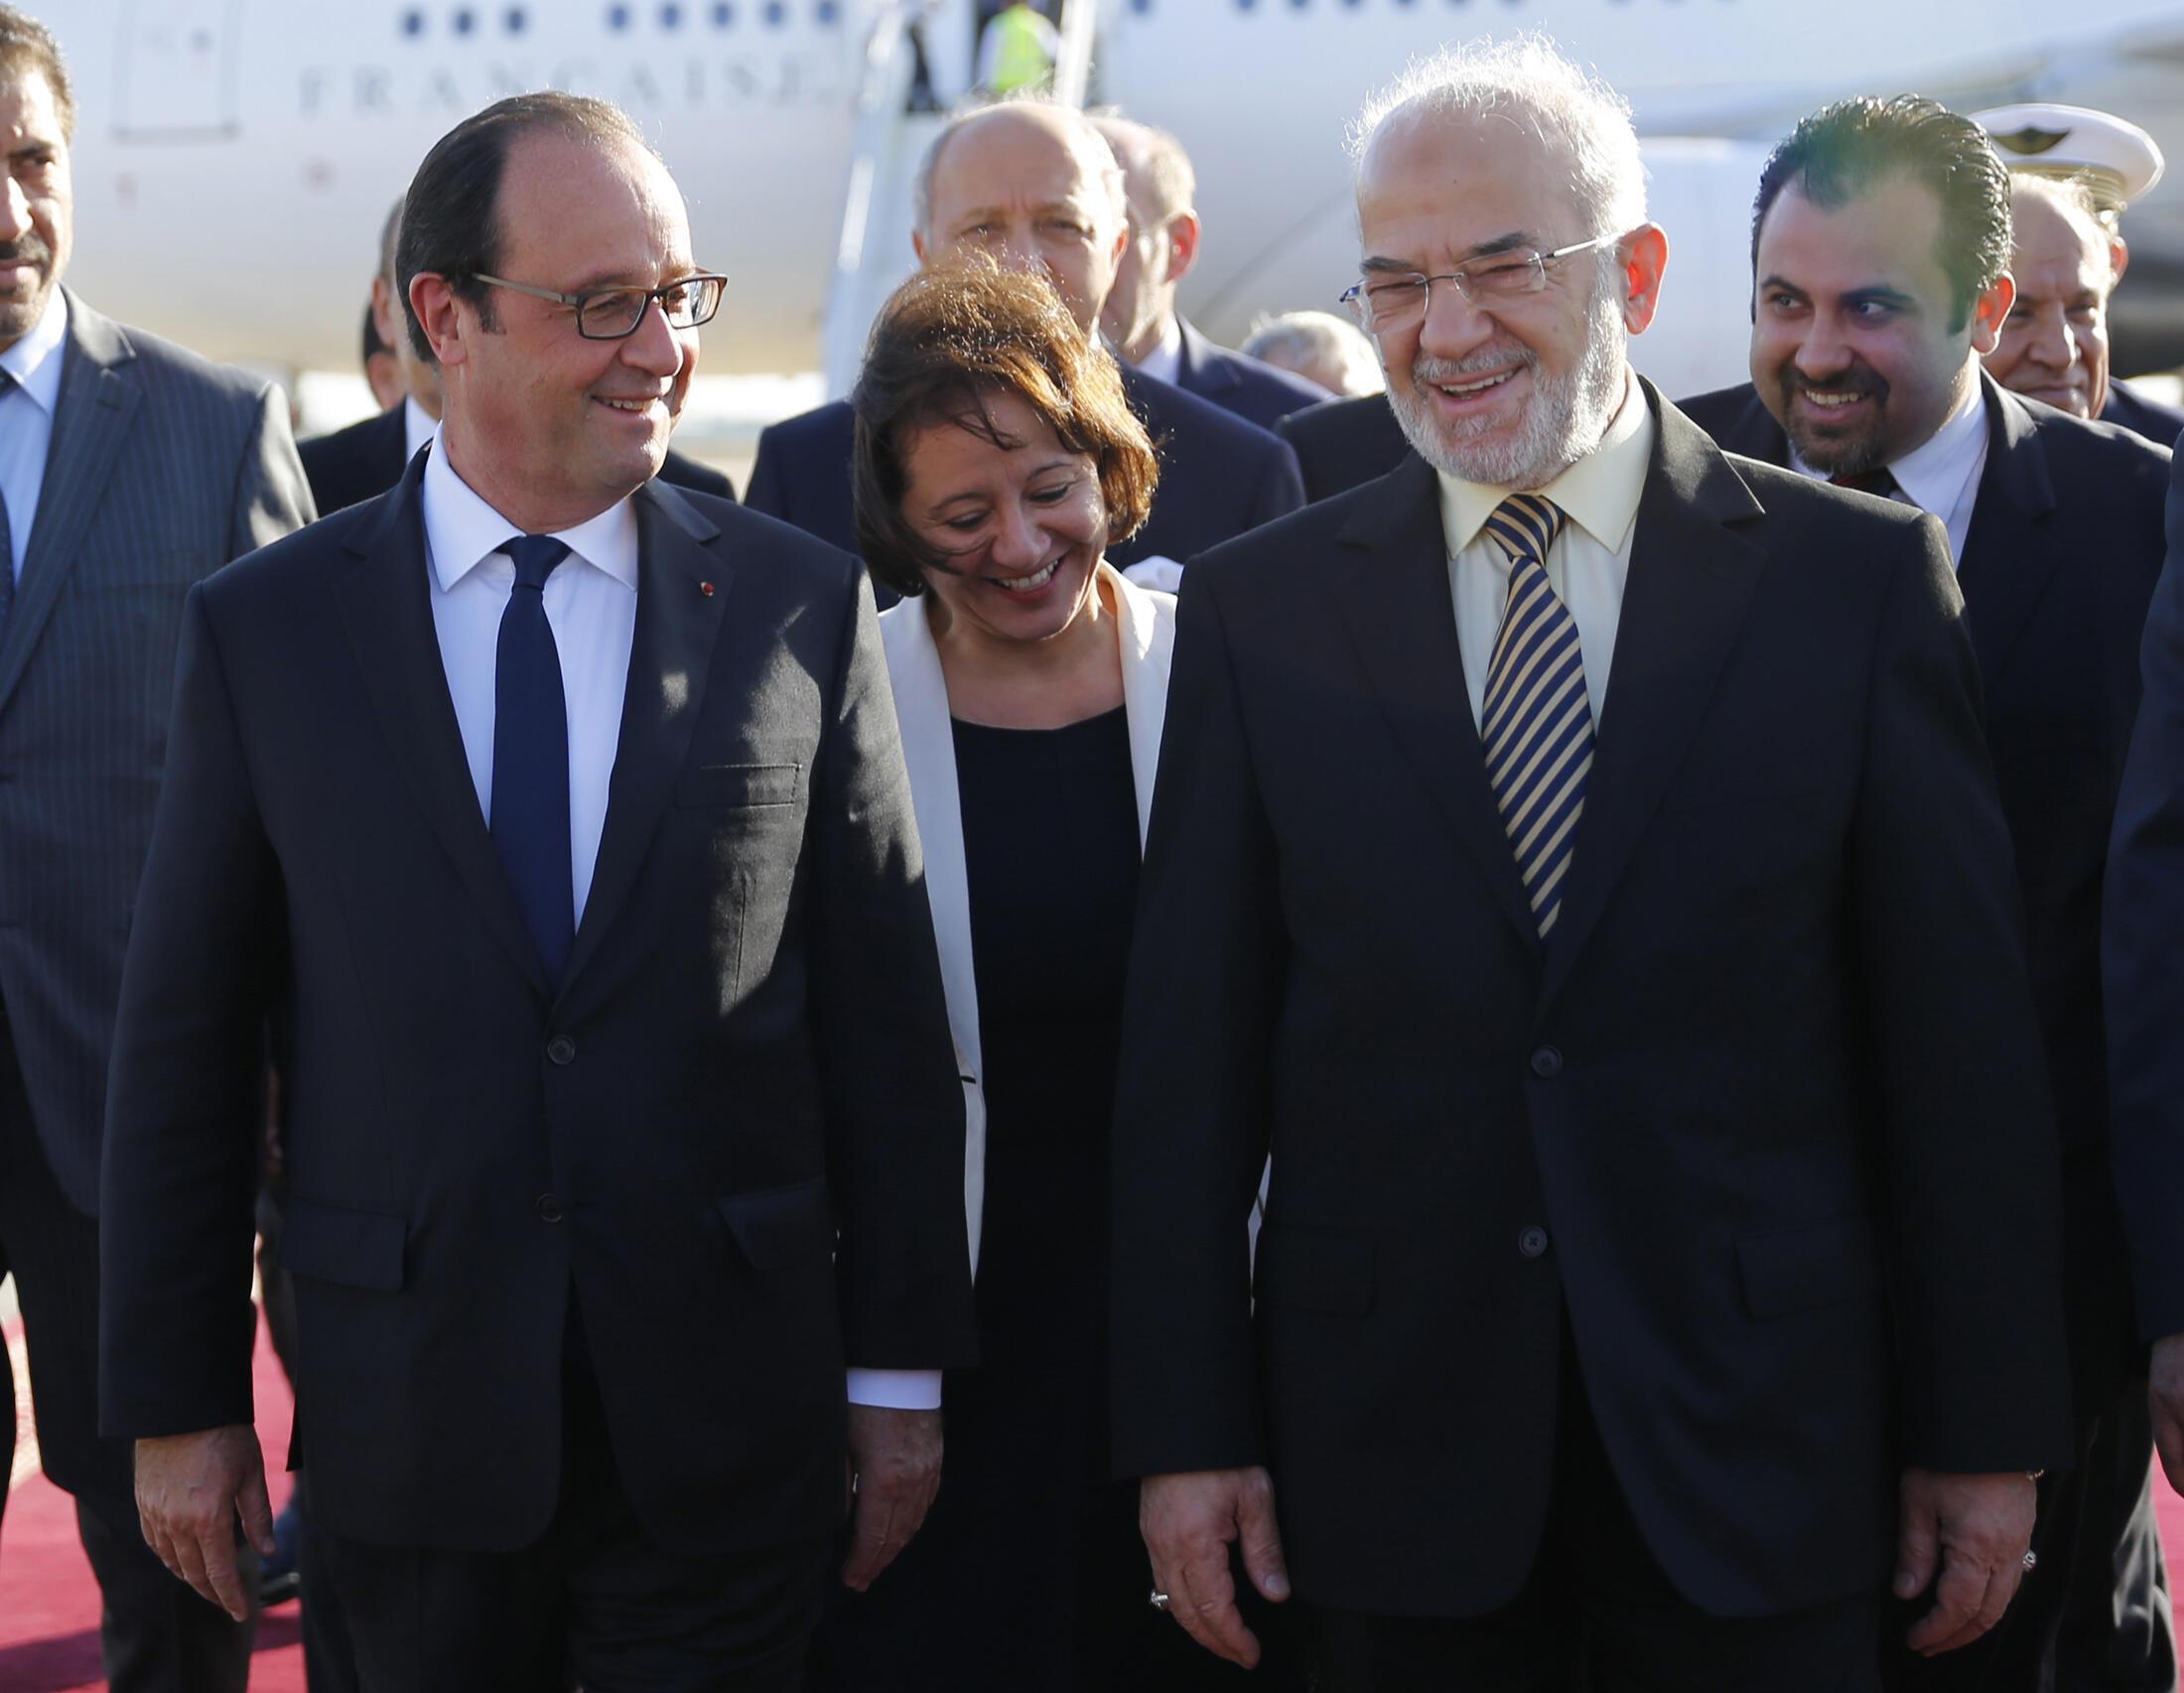 Президент Франции Француа Олланд и министр иностранных дел Ирака Ибрагим аль-Джаафари, Багдад, 12 сентября 2014 г.